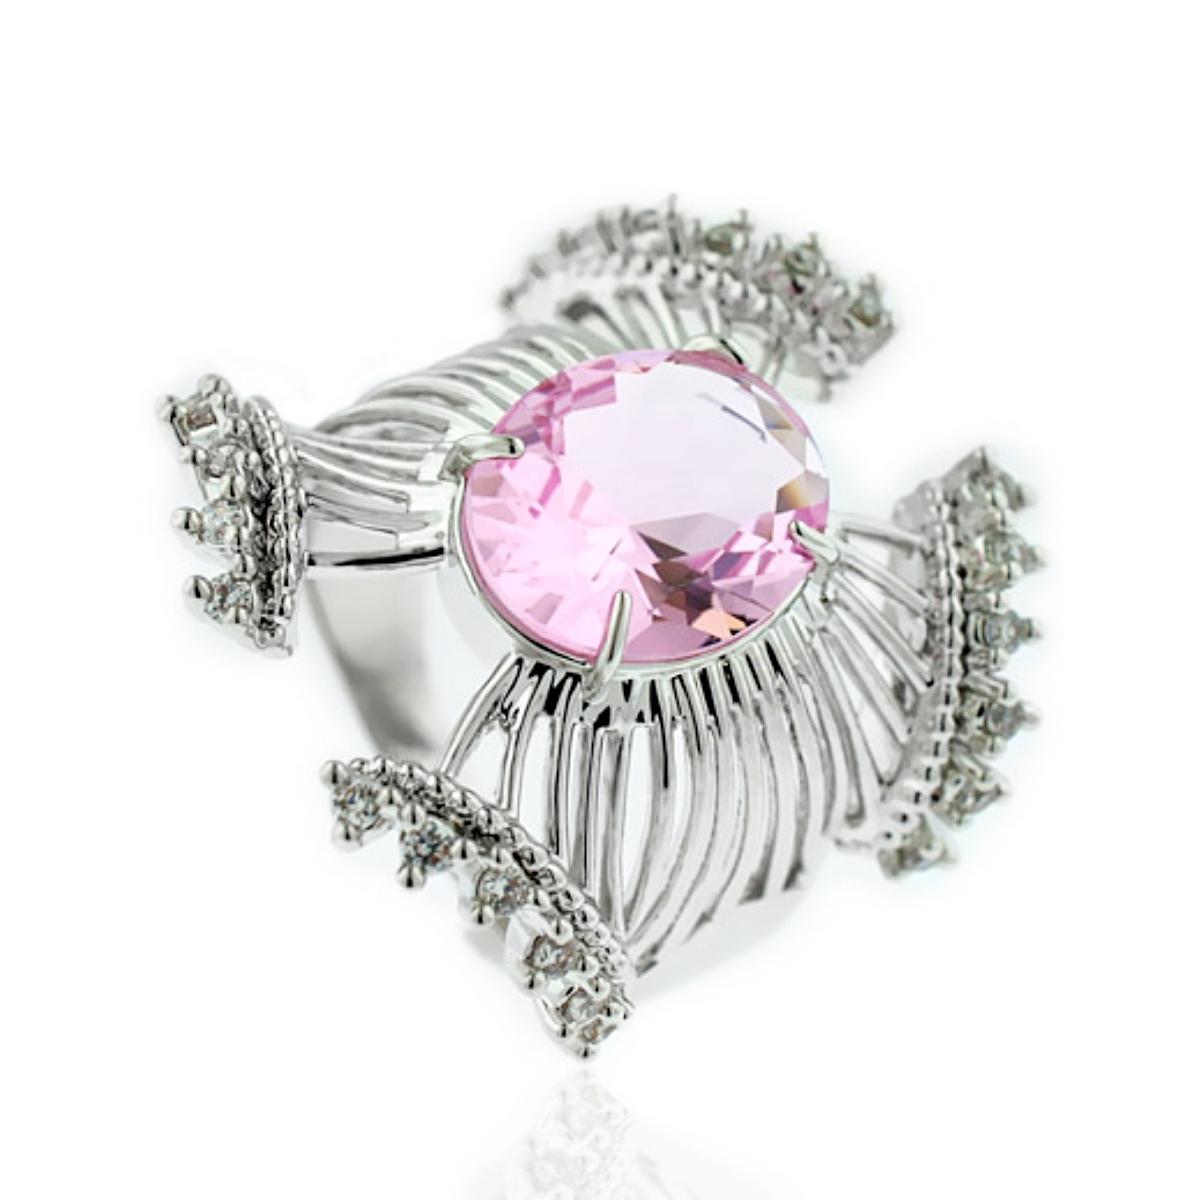 Anel de Filigranas Luxo Semijoia em Ródio Branco com Zircônia Branca e Cristal Rosa Safira  - Soloyou